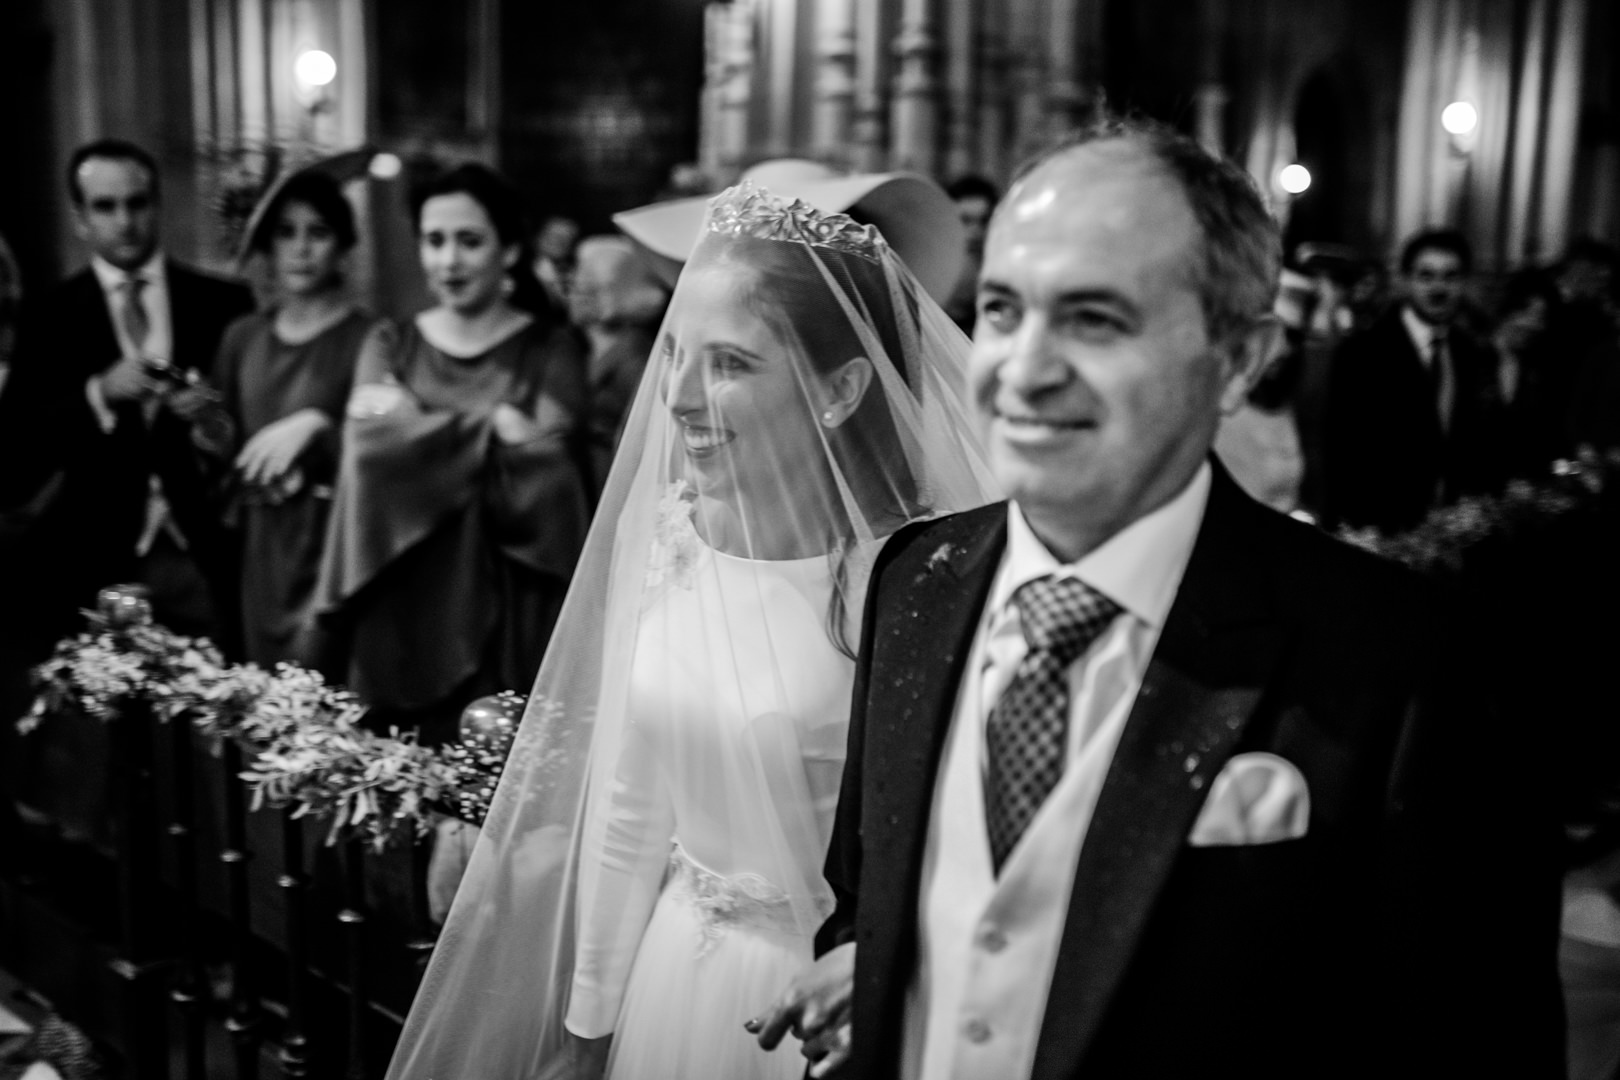 Boda-sevilla-Wedding-engagement-Rafael-Torres-fotografo-bodas-sevilla-madrid-barcelona-wedding-photographer--32.jpg